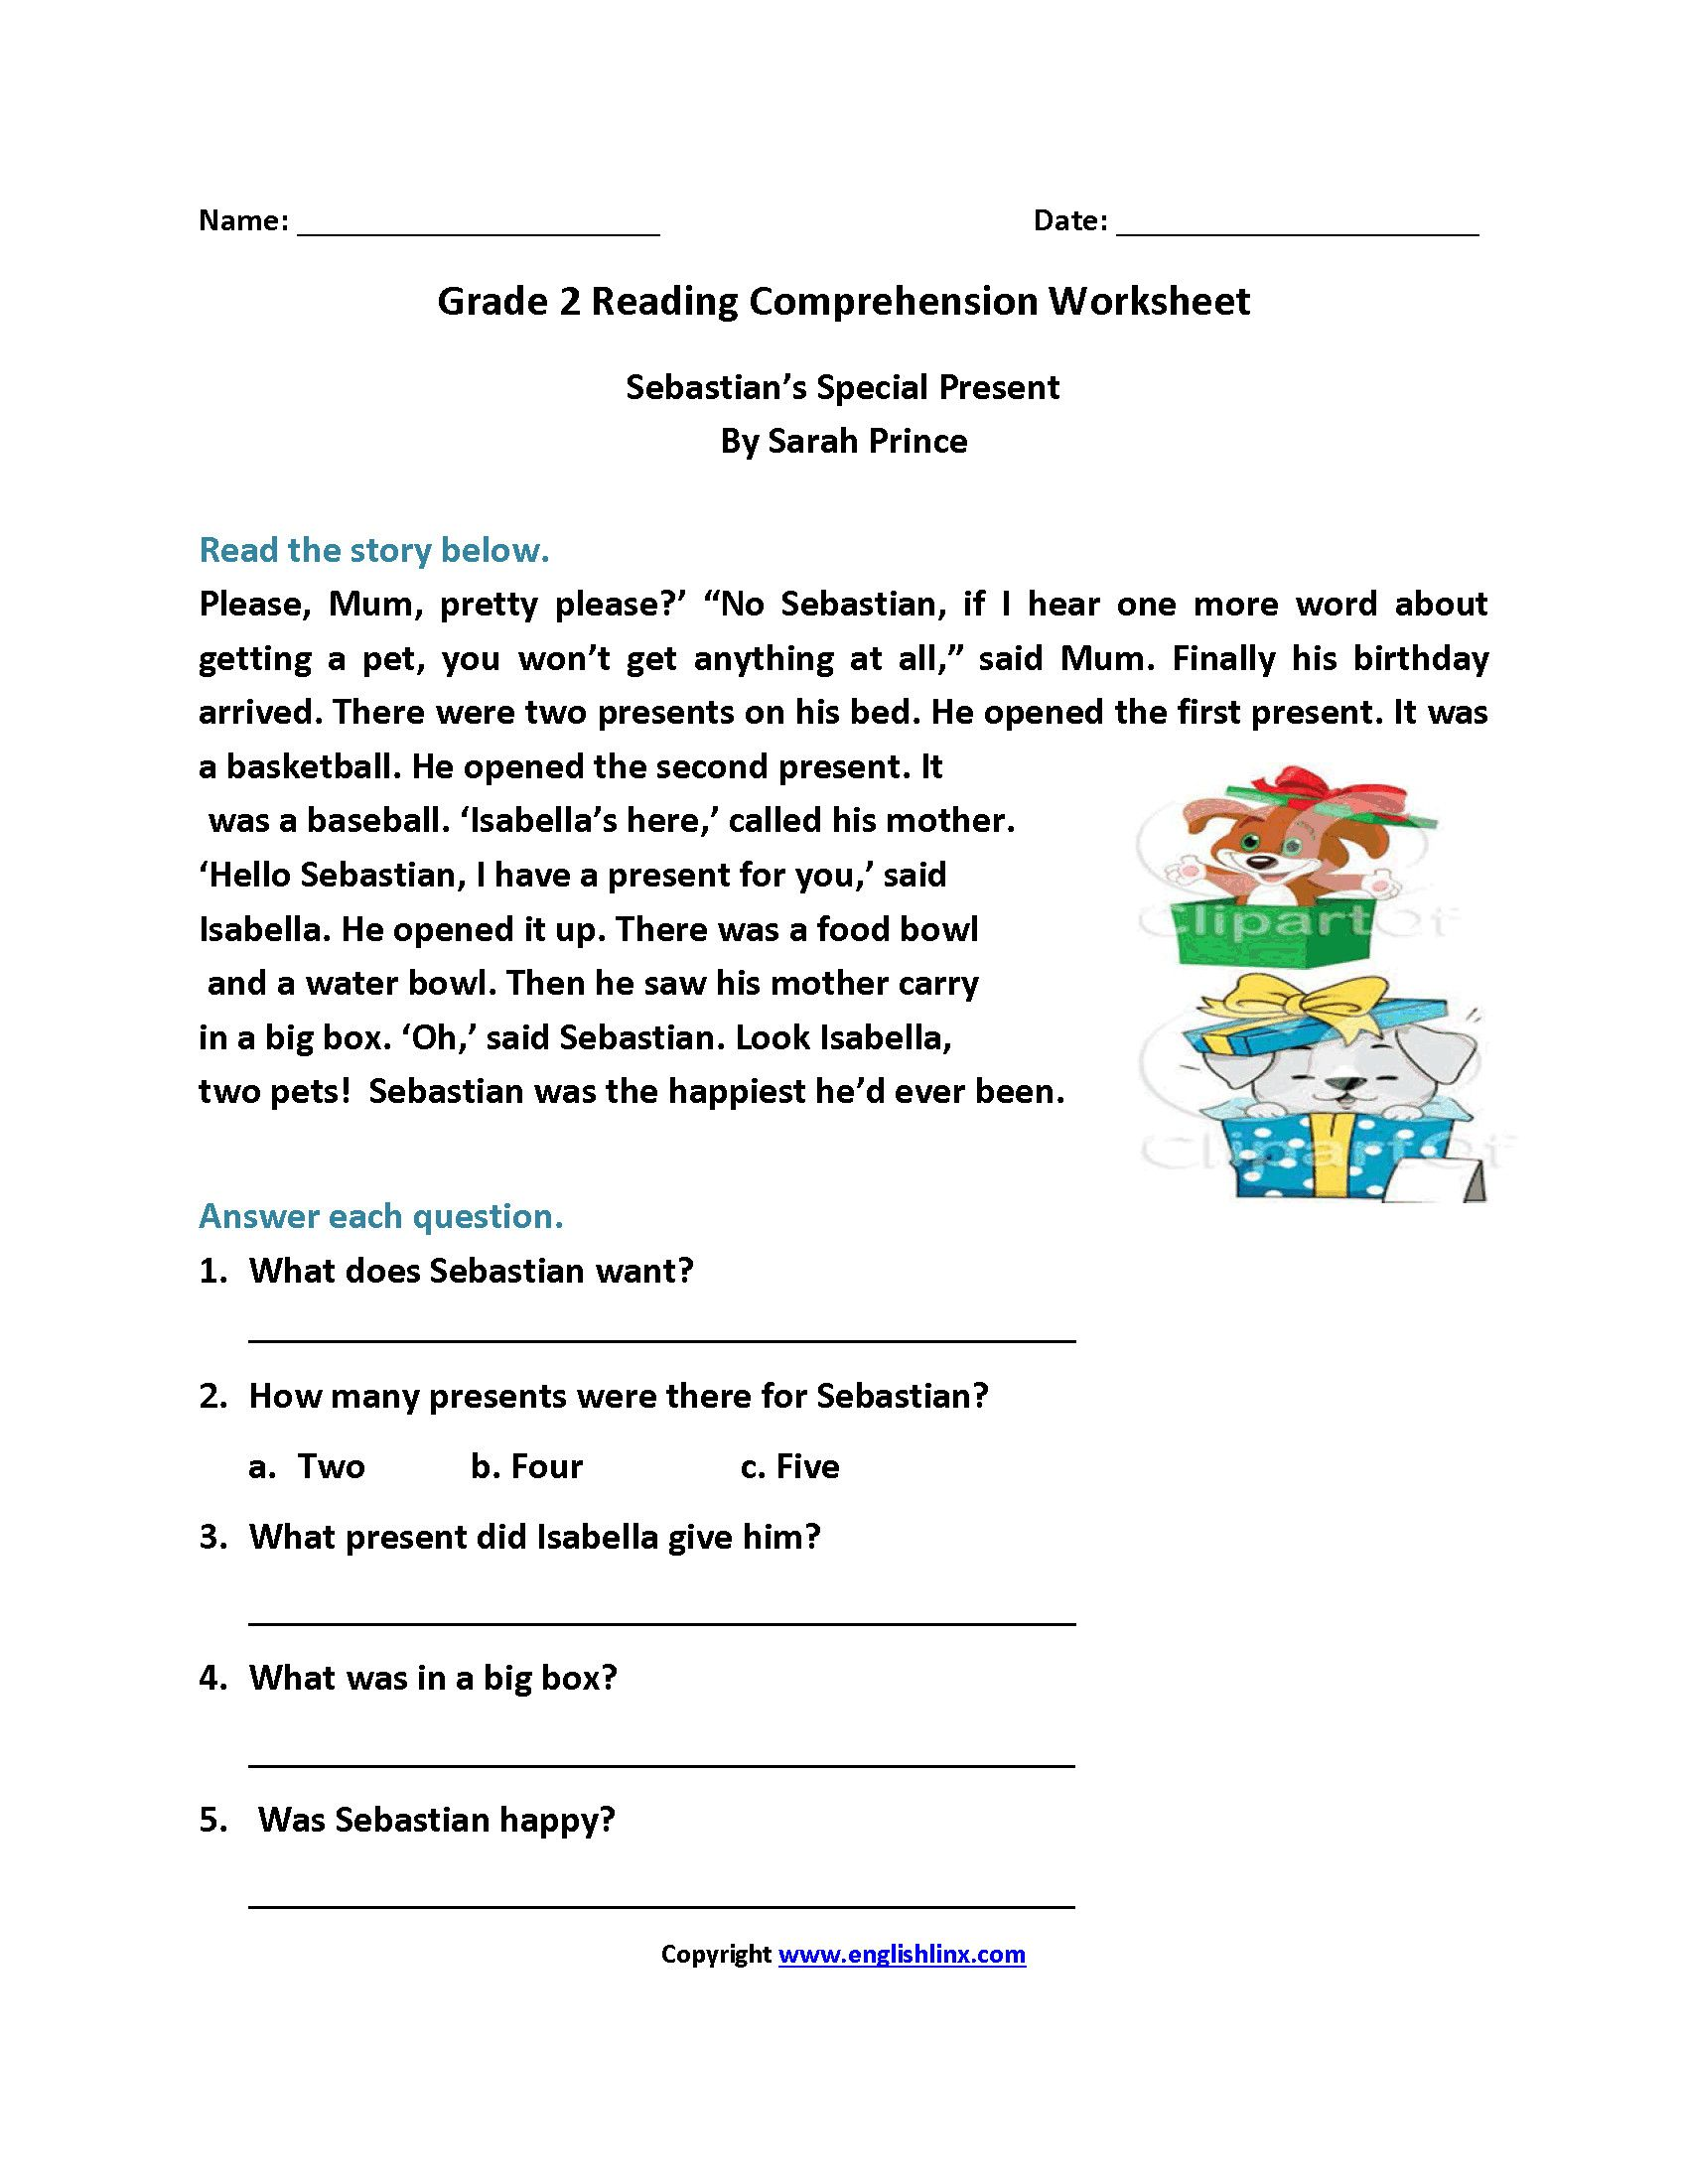 2nd Grade Reading Comprehension Worksheets In 2020 Reading Comprehension Worksheets Reading Worksheets Comprehension Worksheets